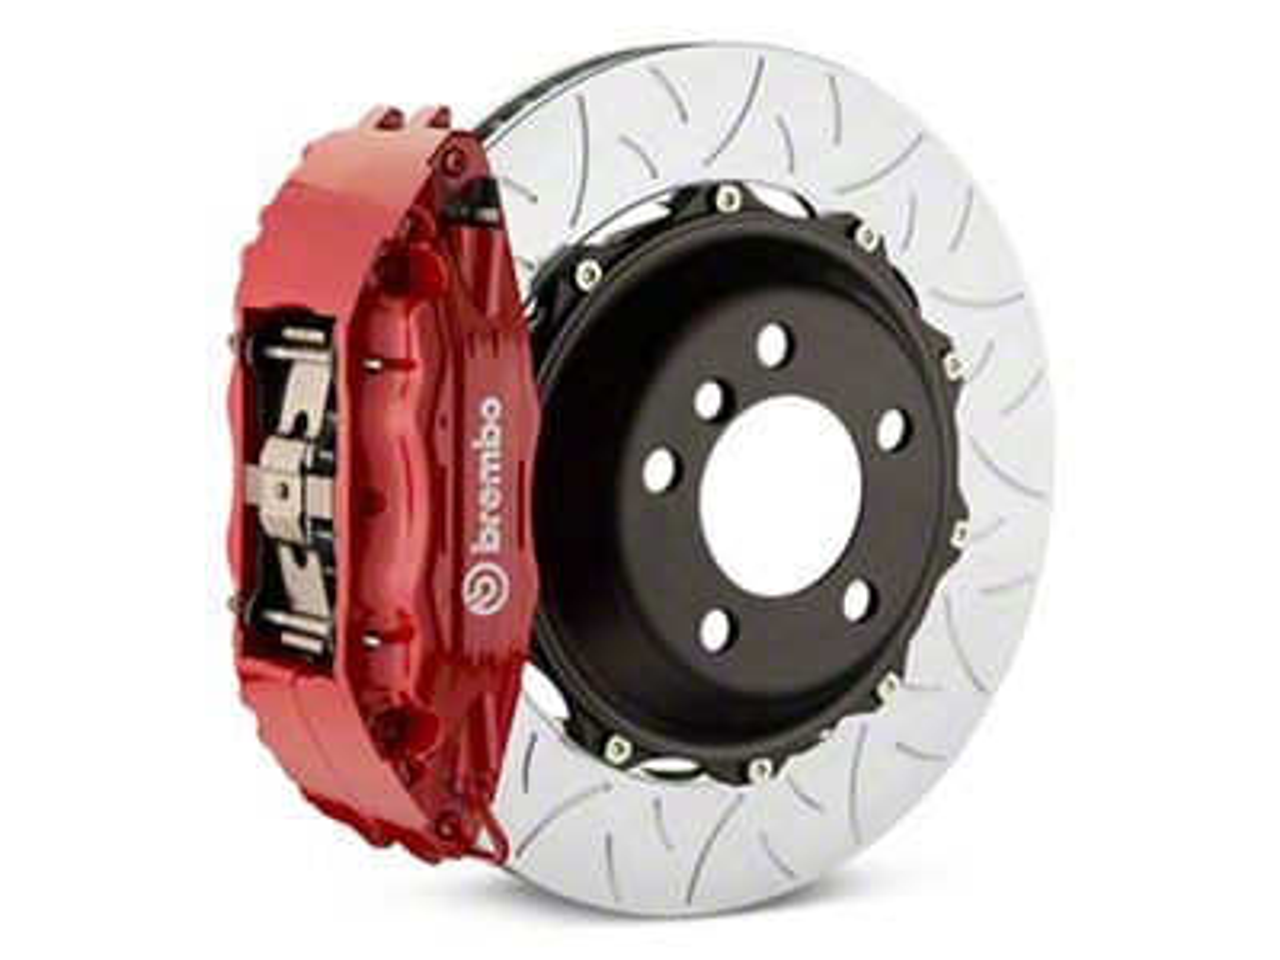 Brembo GT Series 4-Piston Rear Brake Kit - Type 3 Slotted Rotors - Red (14-18 Silverado 1500)